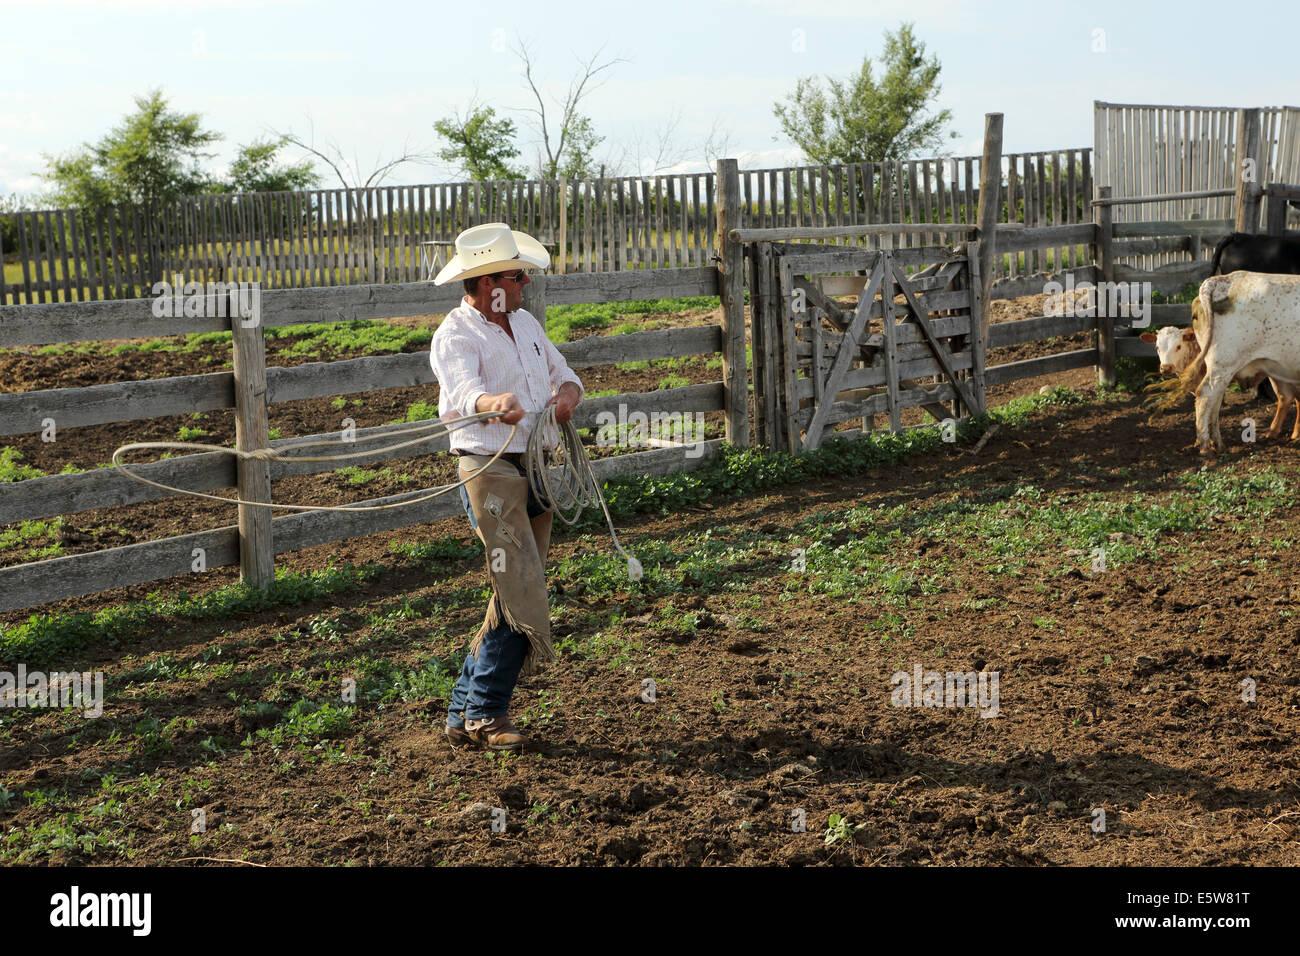 A man uses a lasso at La Reata Ranch near Kyle, Saskatchewan, Canada. - Stock Image